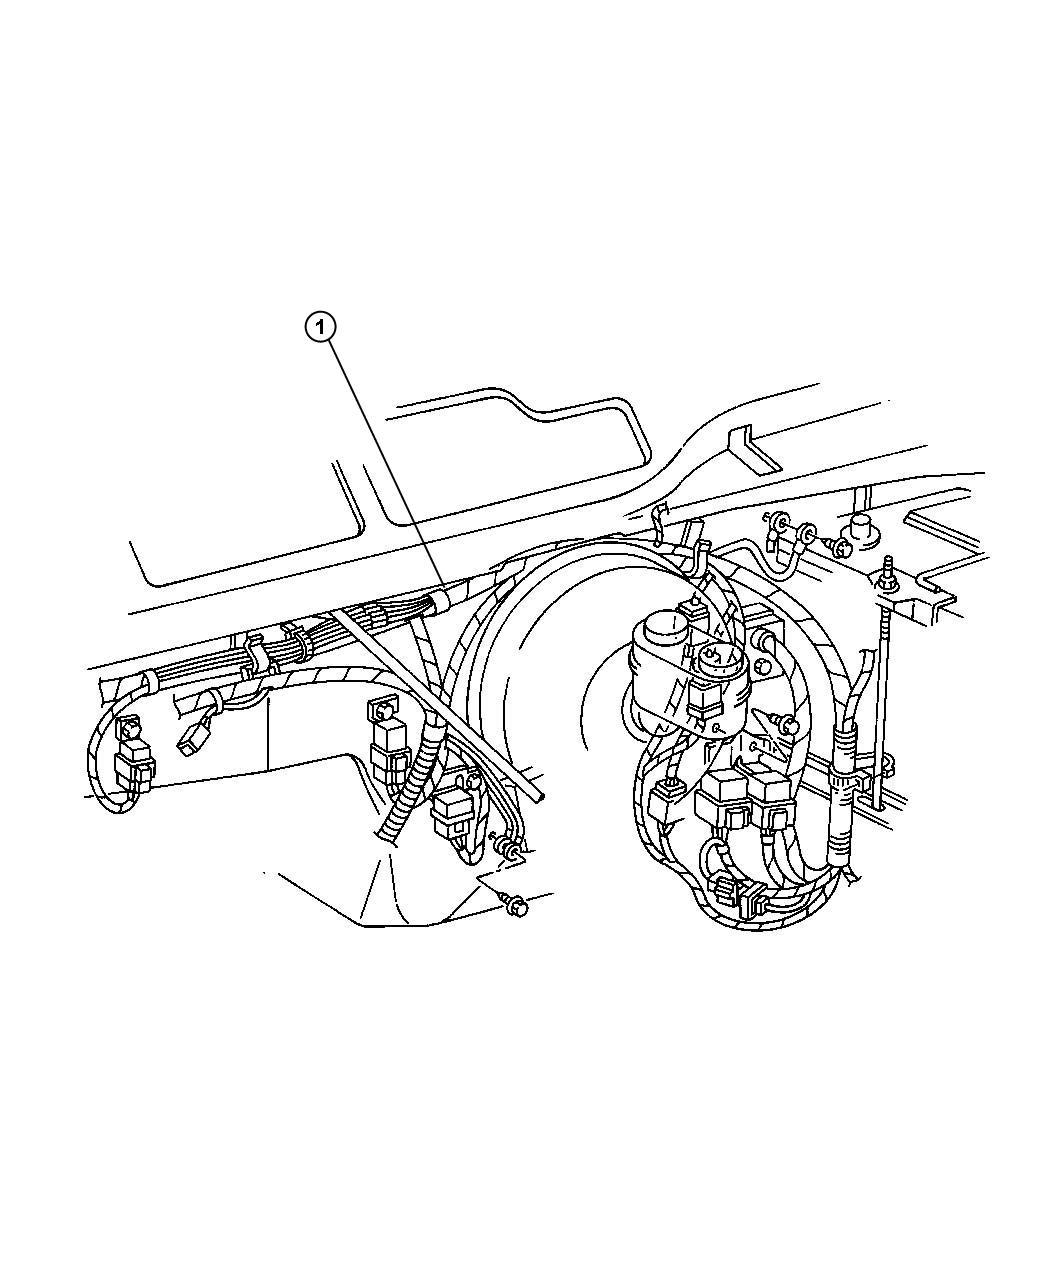 2002 Jeep Liberty Wiring, Headlamp / Dash